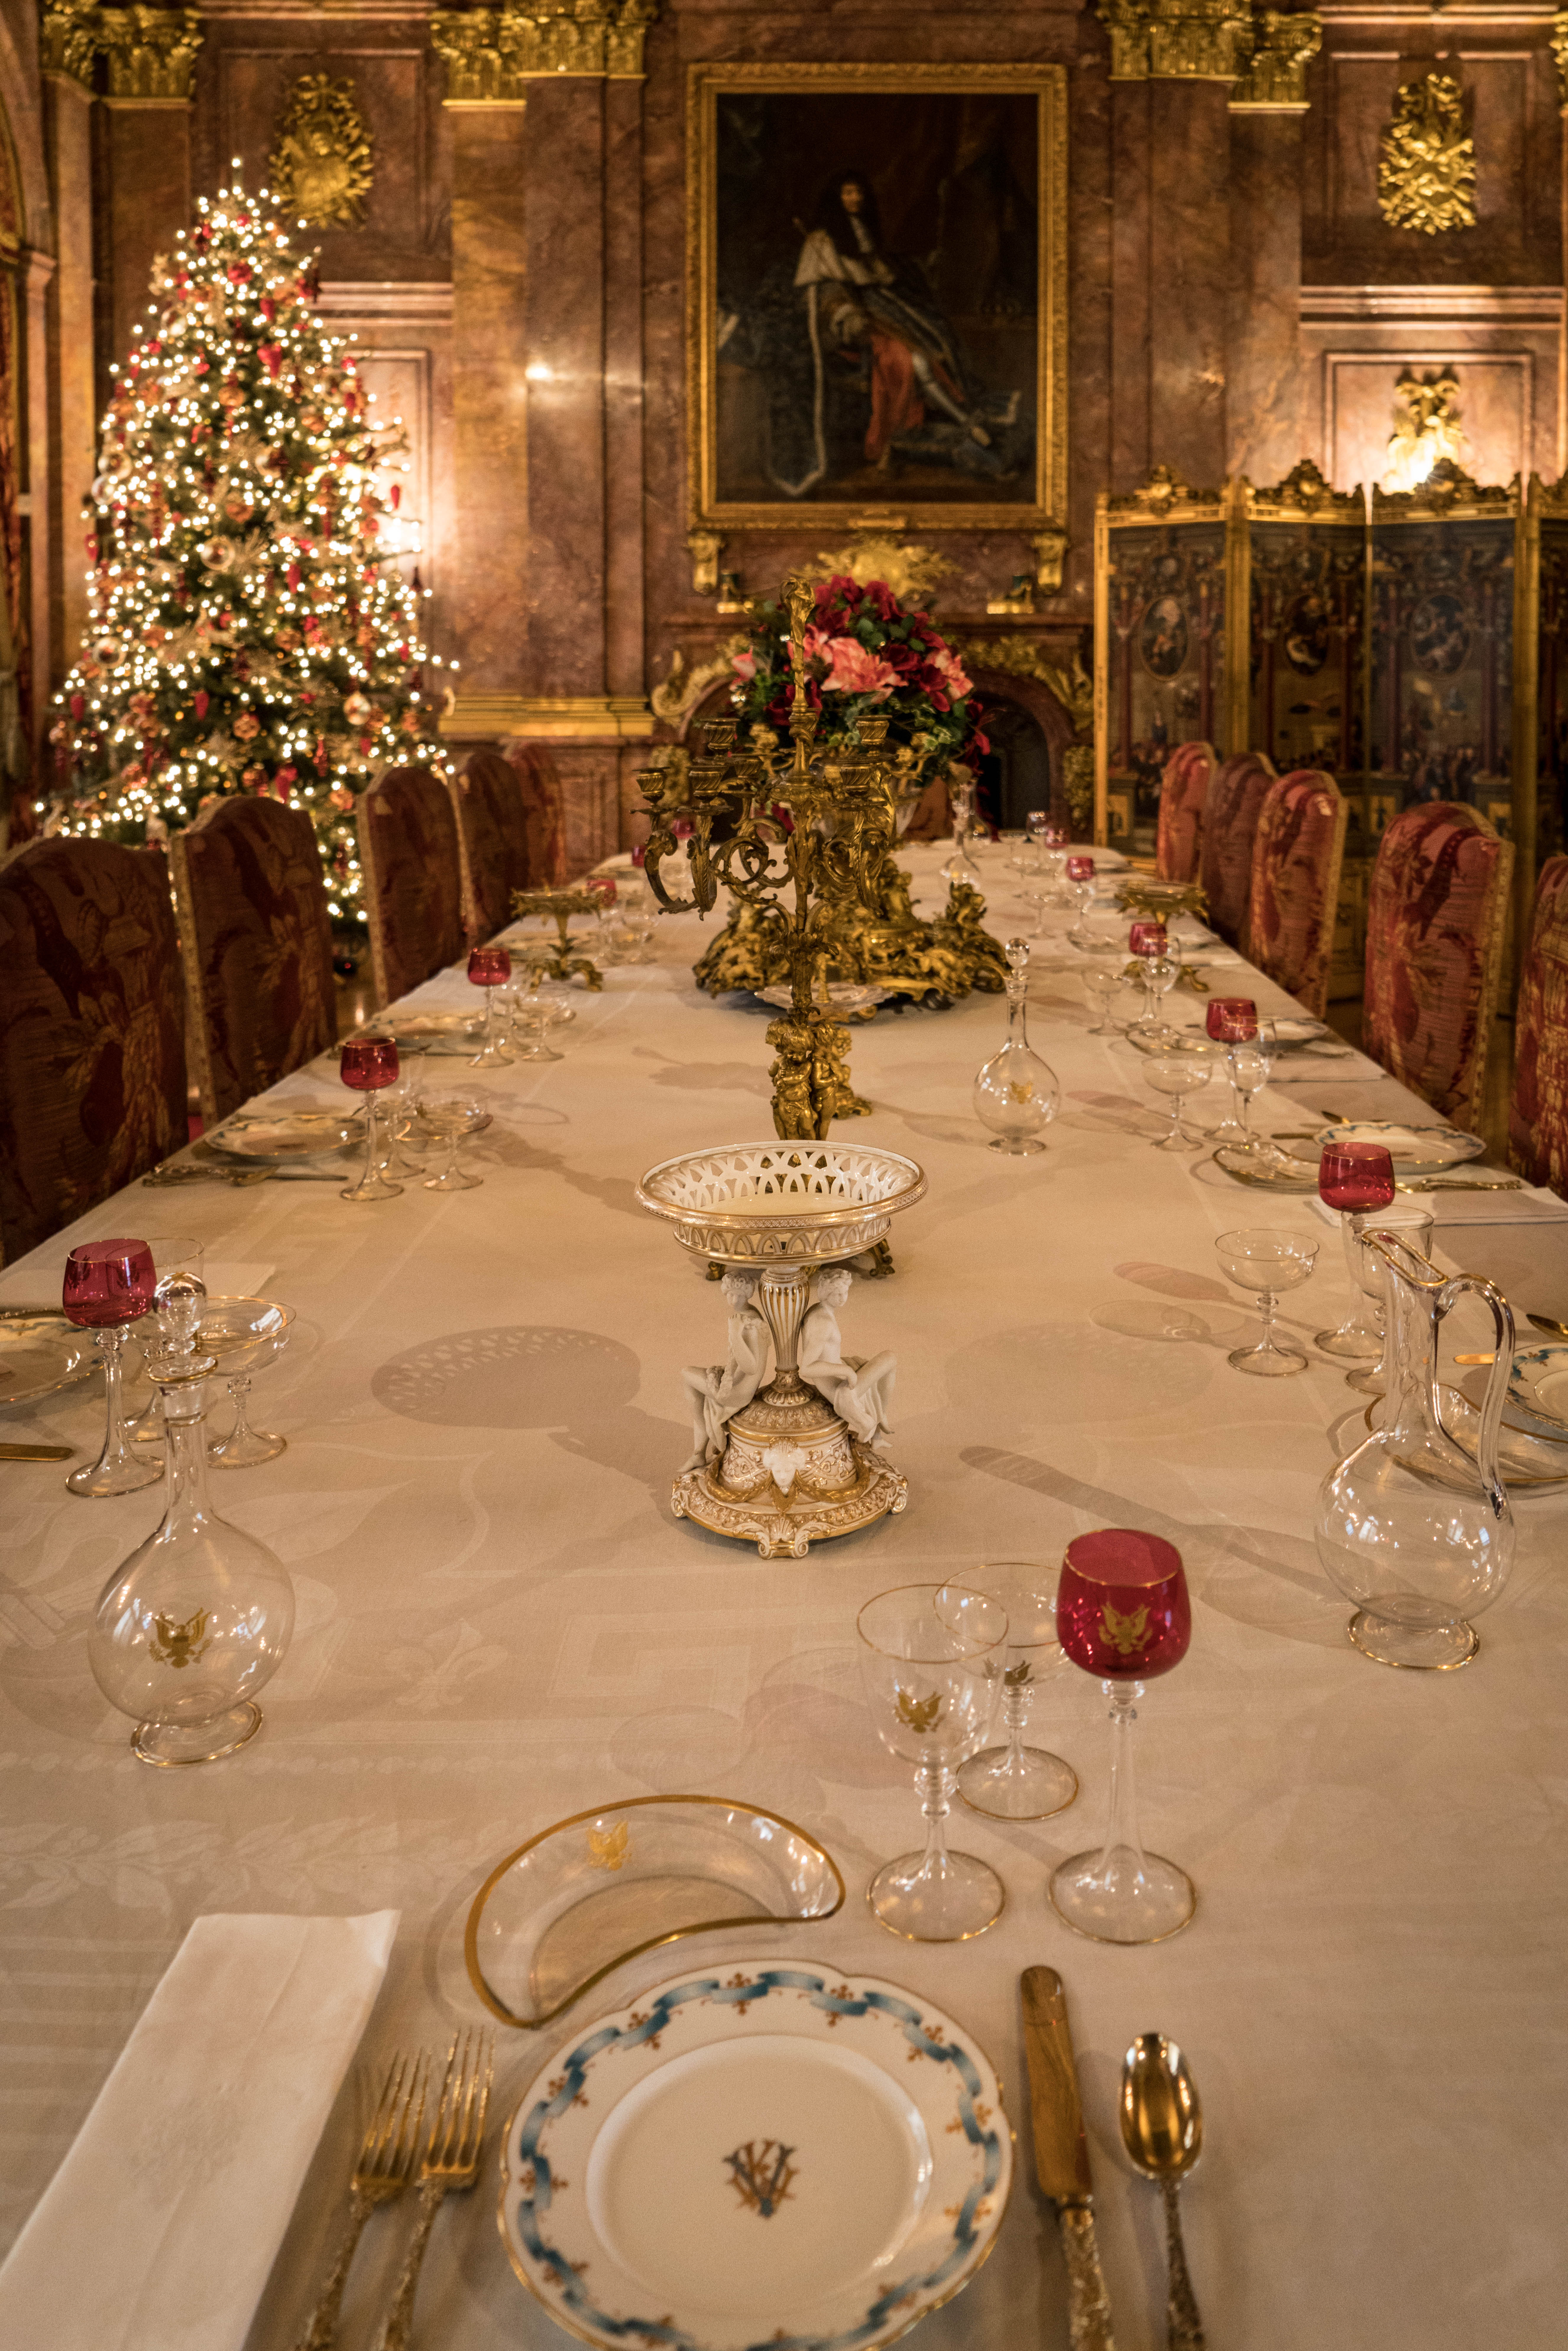 #marablehouse, #mansions, #newport, #newportmansions, #rhodeisland, #vanderbiilt, #diningroom, #christmas